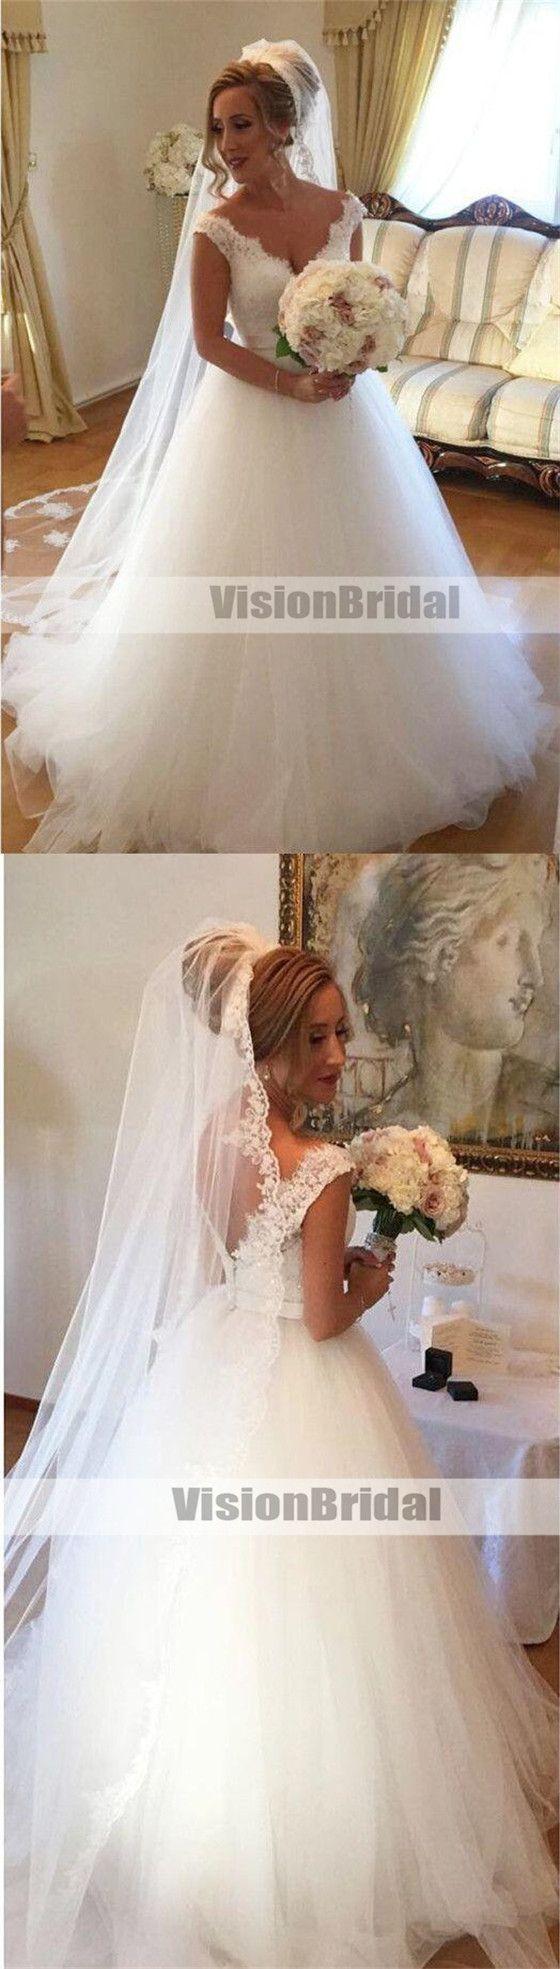 Wedding dress rental los angeles   best Wedding Stuff images on Pinterest  Short wedding gowns